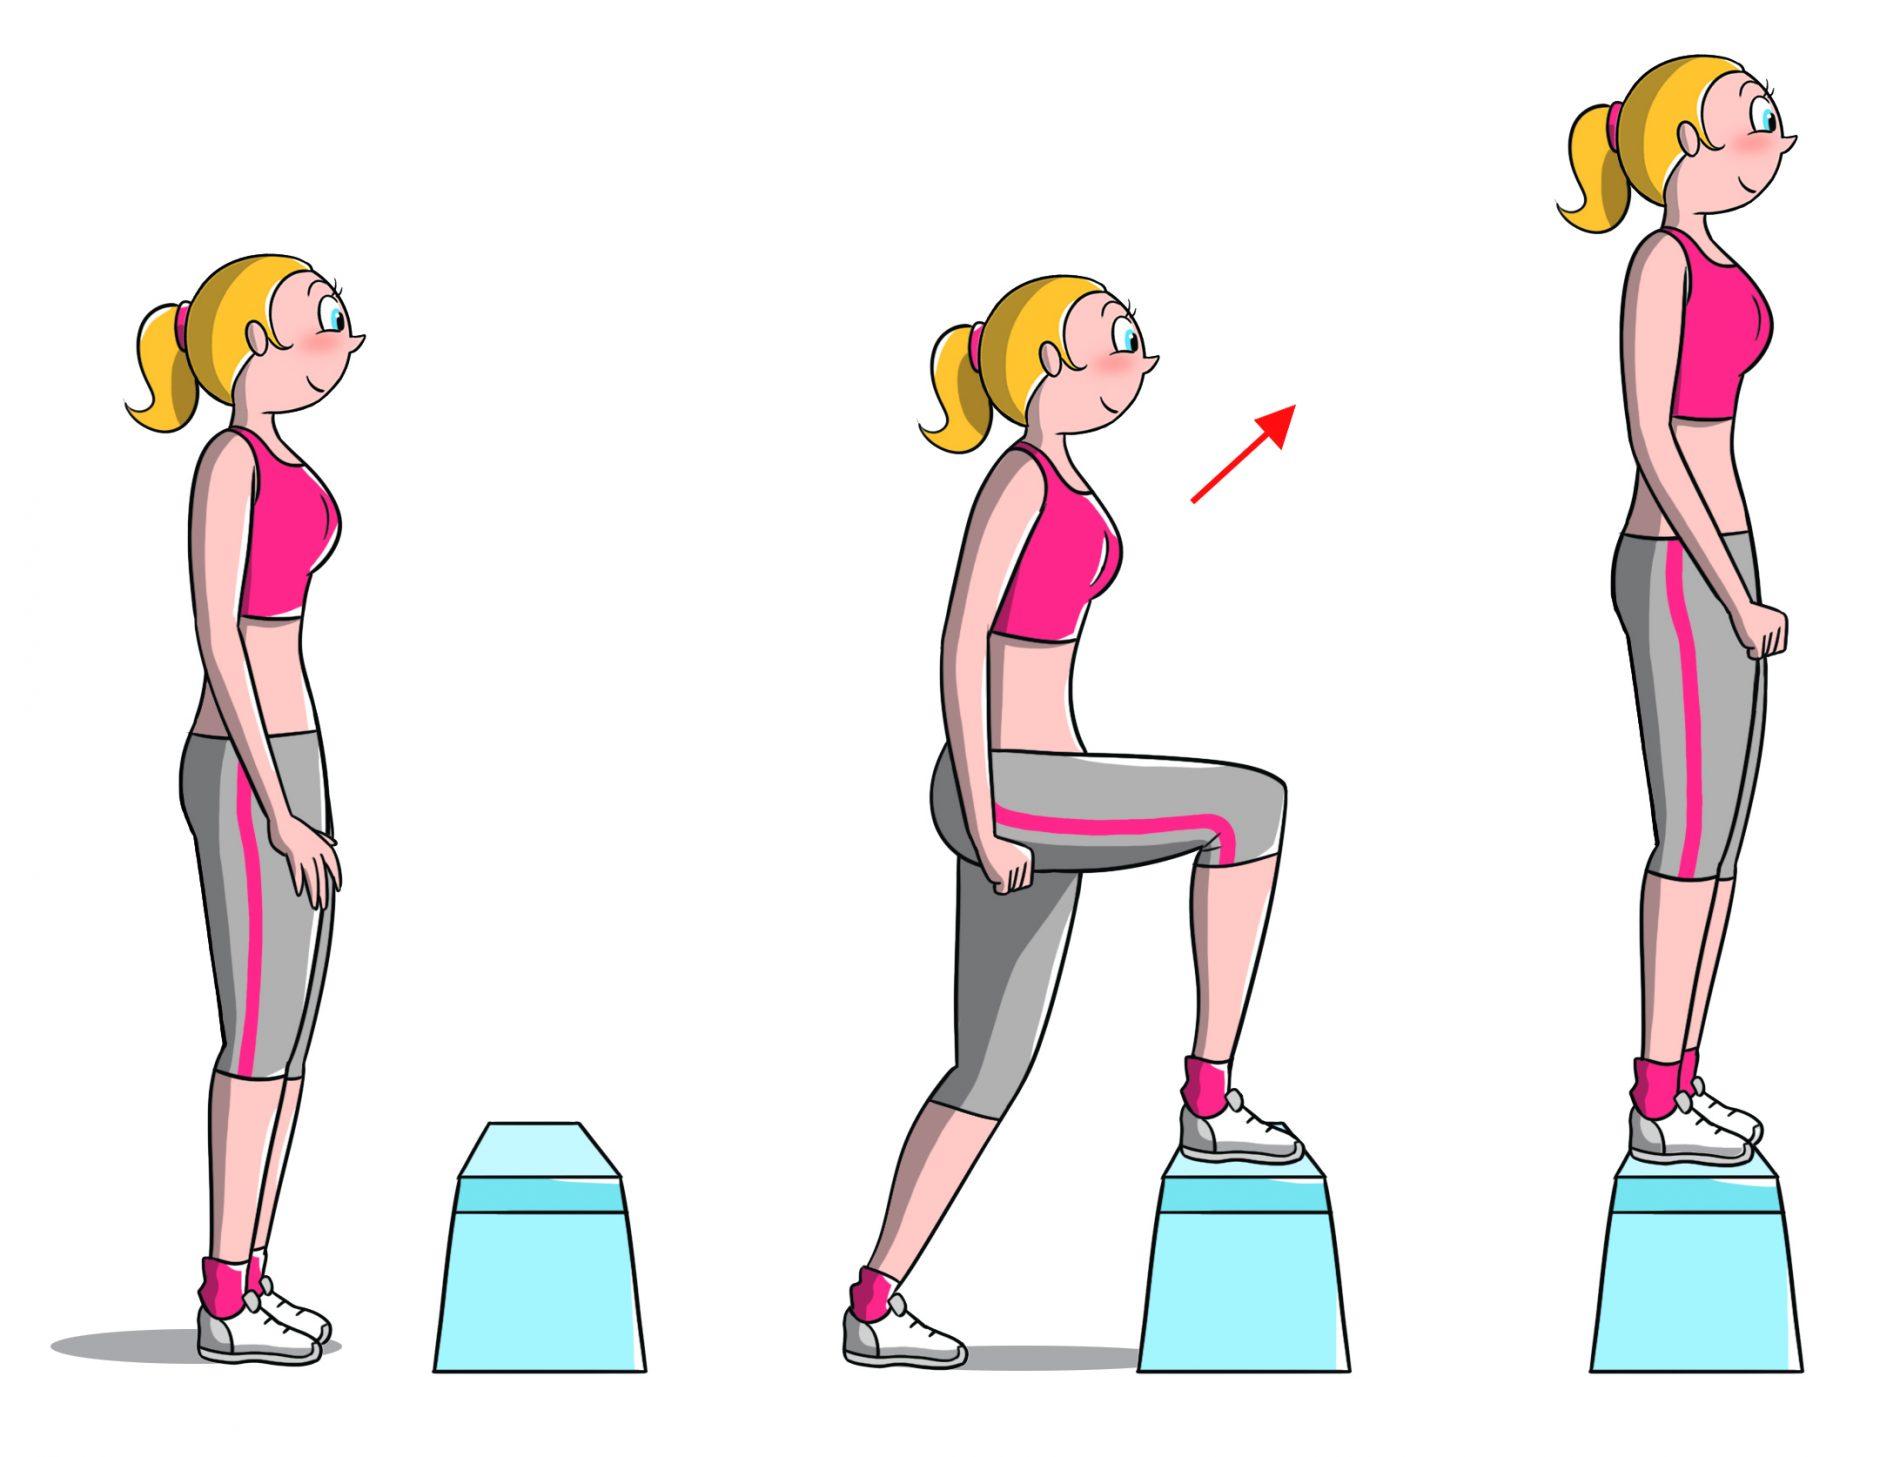 allenamento per fisico a clessidra, step up